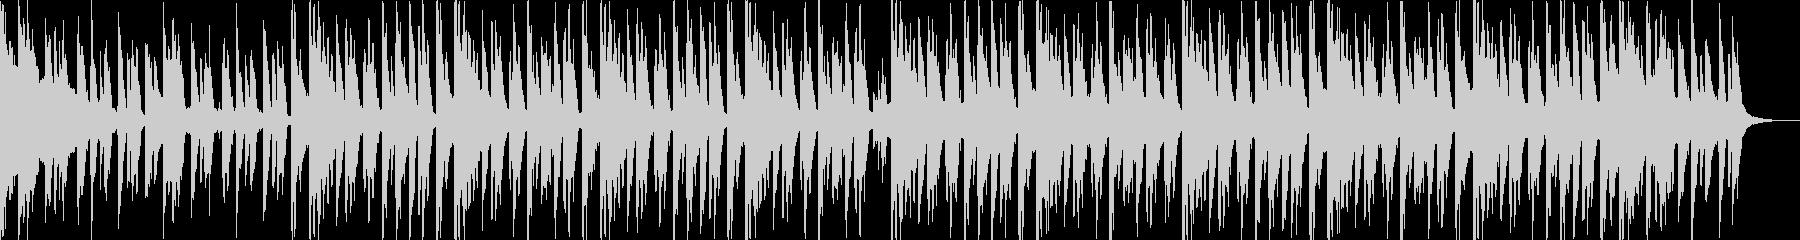 EDMドロップオンリー 04の未再生の波形